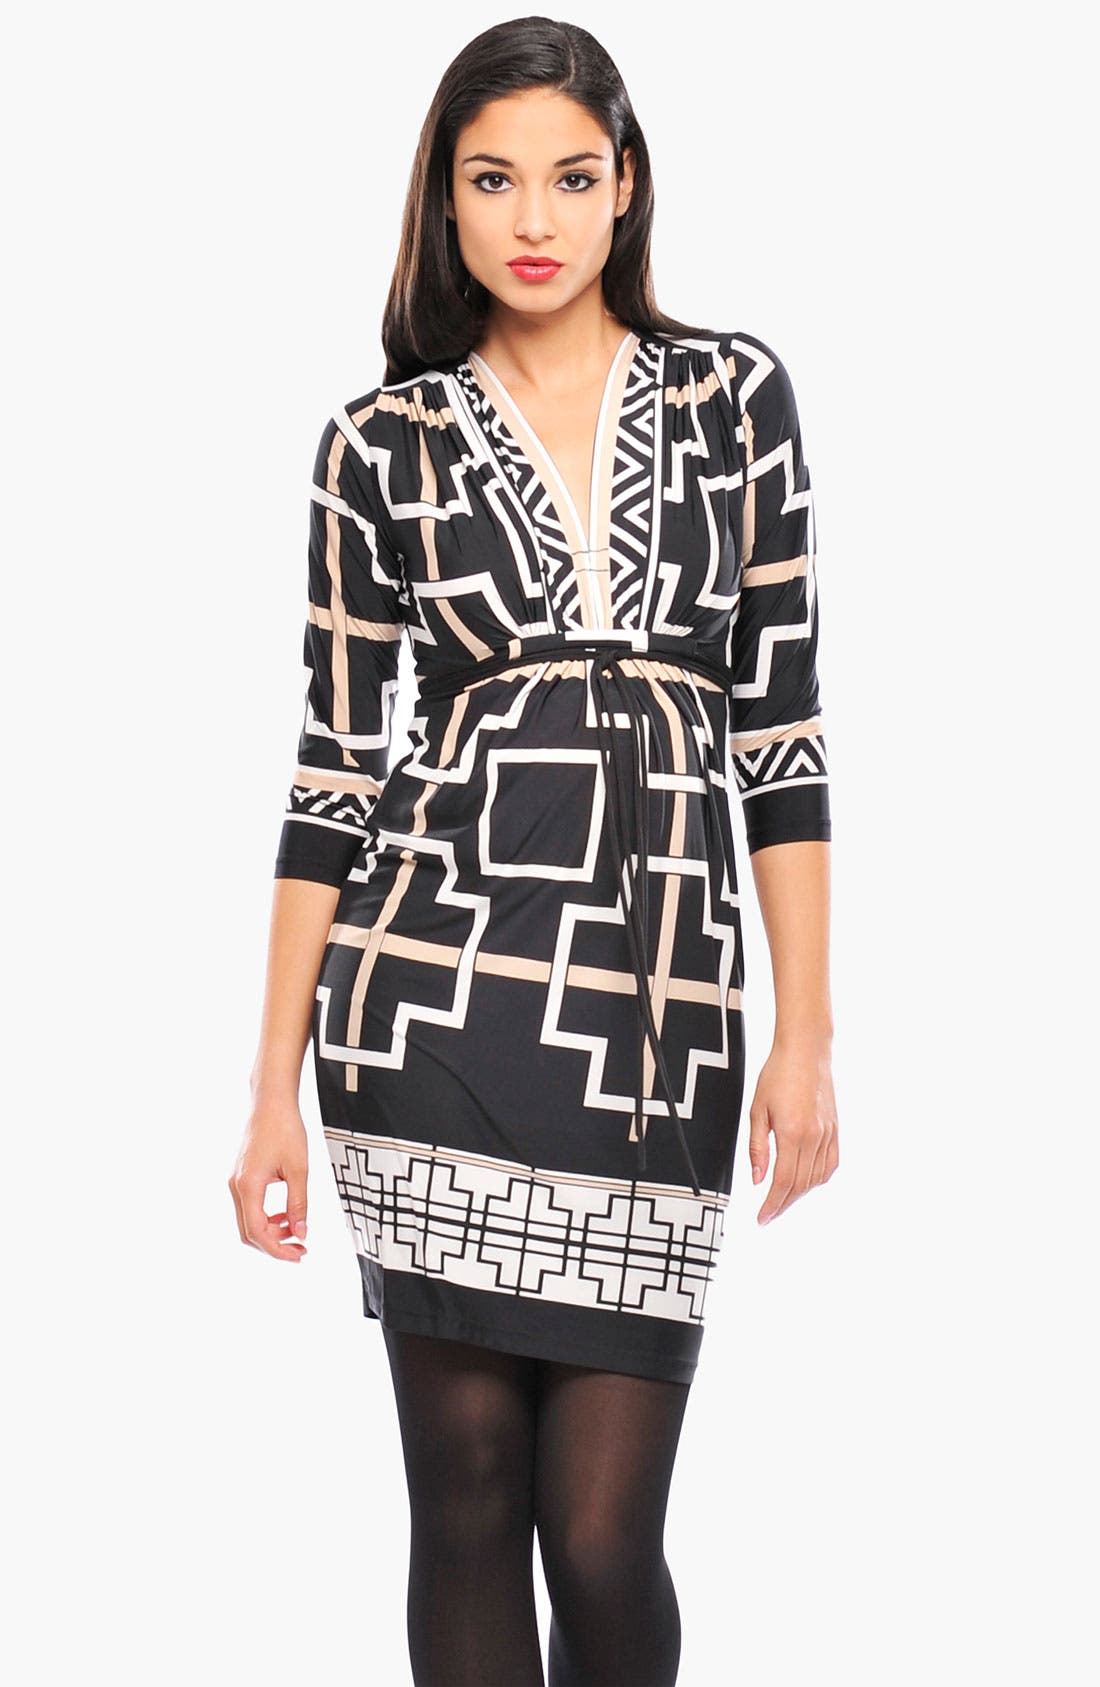 Alternate Image 1 Selected - Olian 'Monique' Print Maternity Wrap Dress